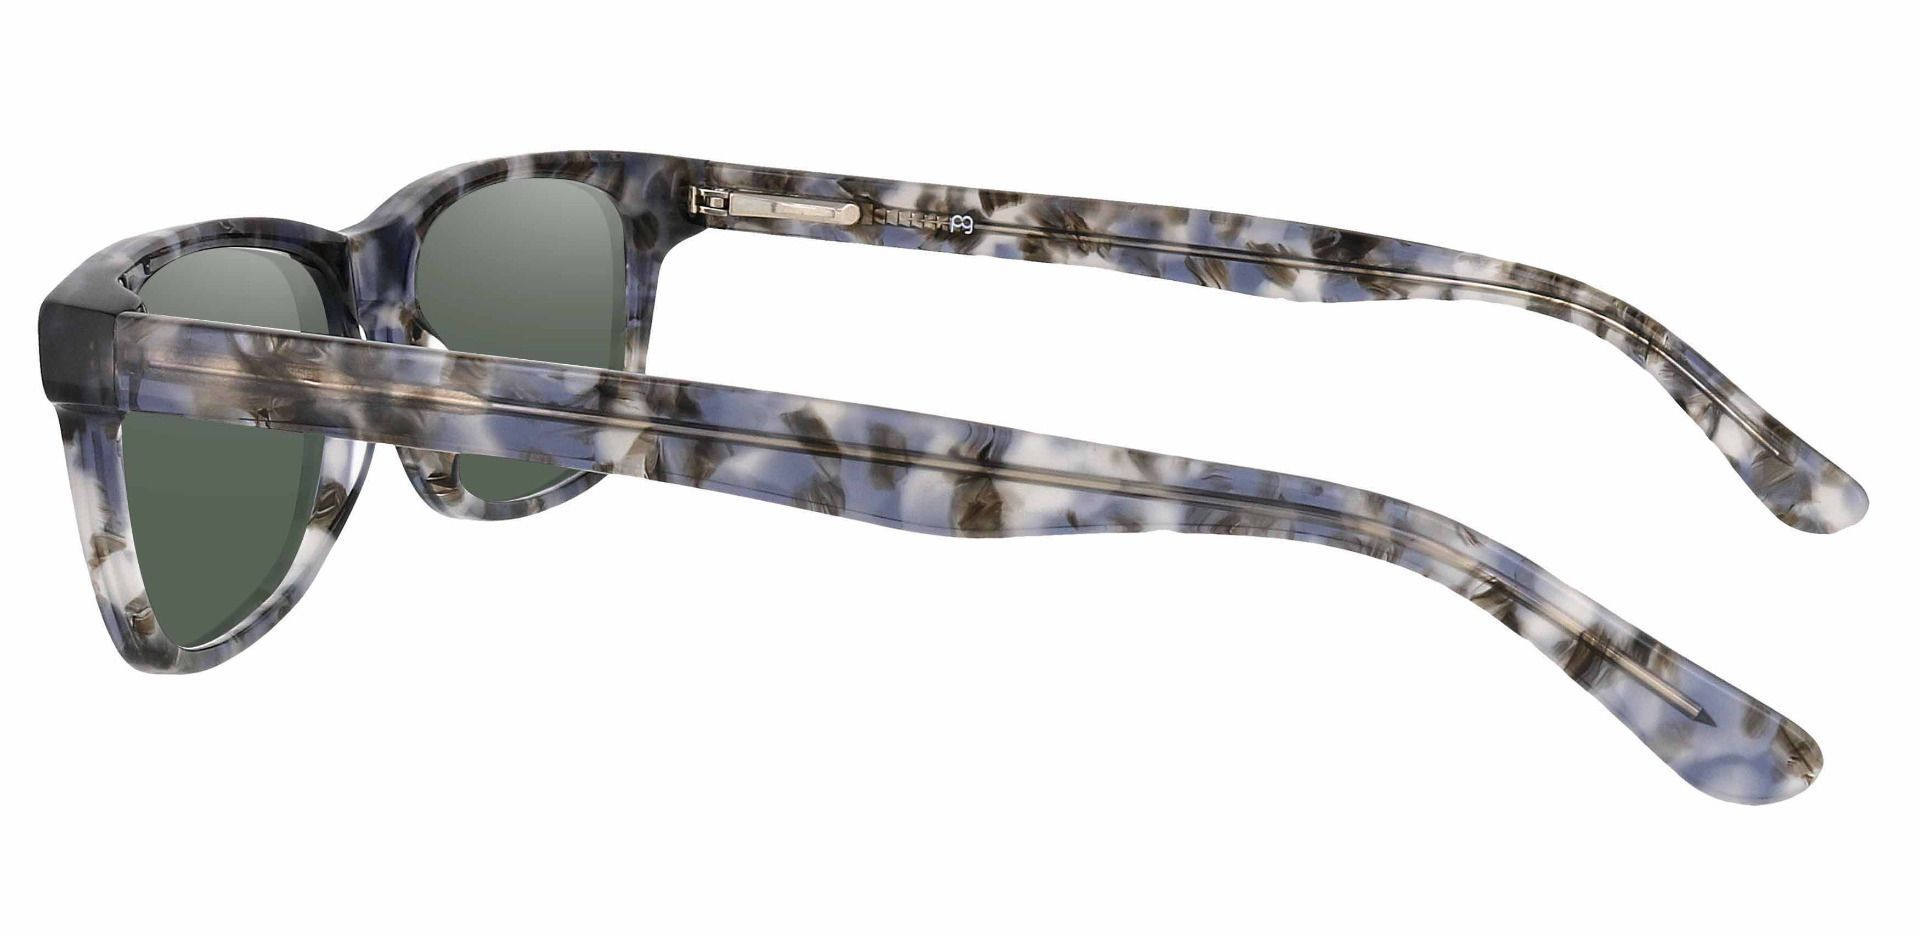 Hendrix Rectangle Prescription Sunglasses - Floral Frame With Green Lenses